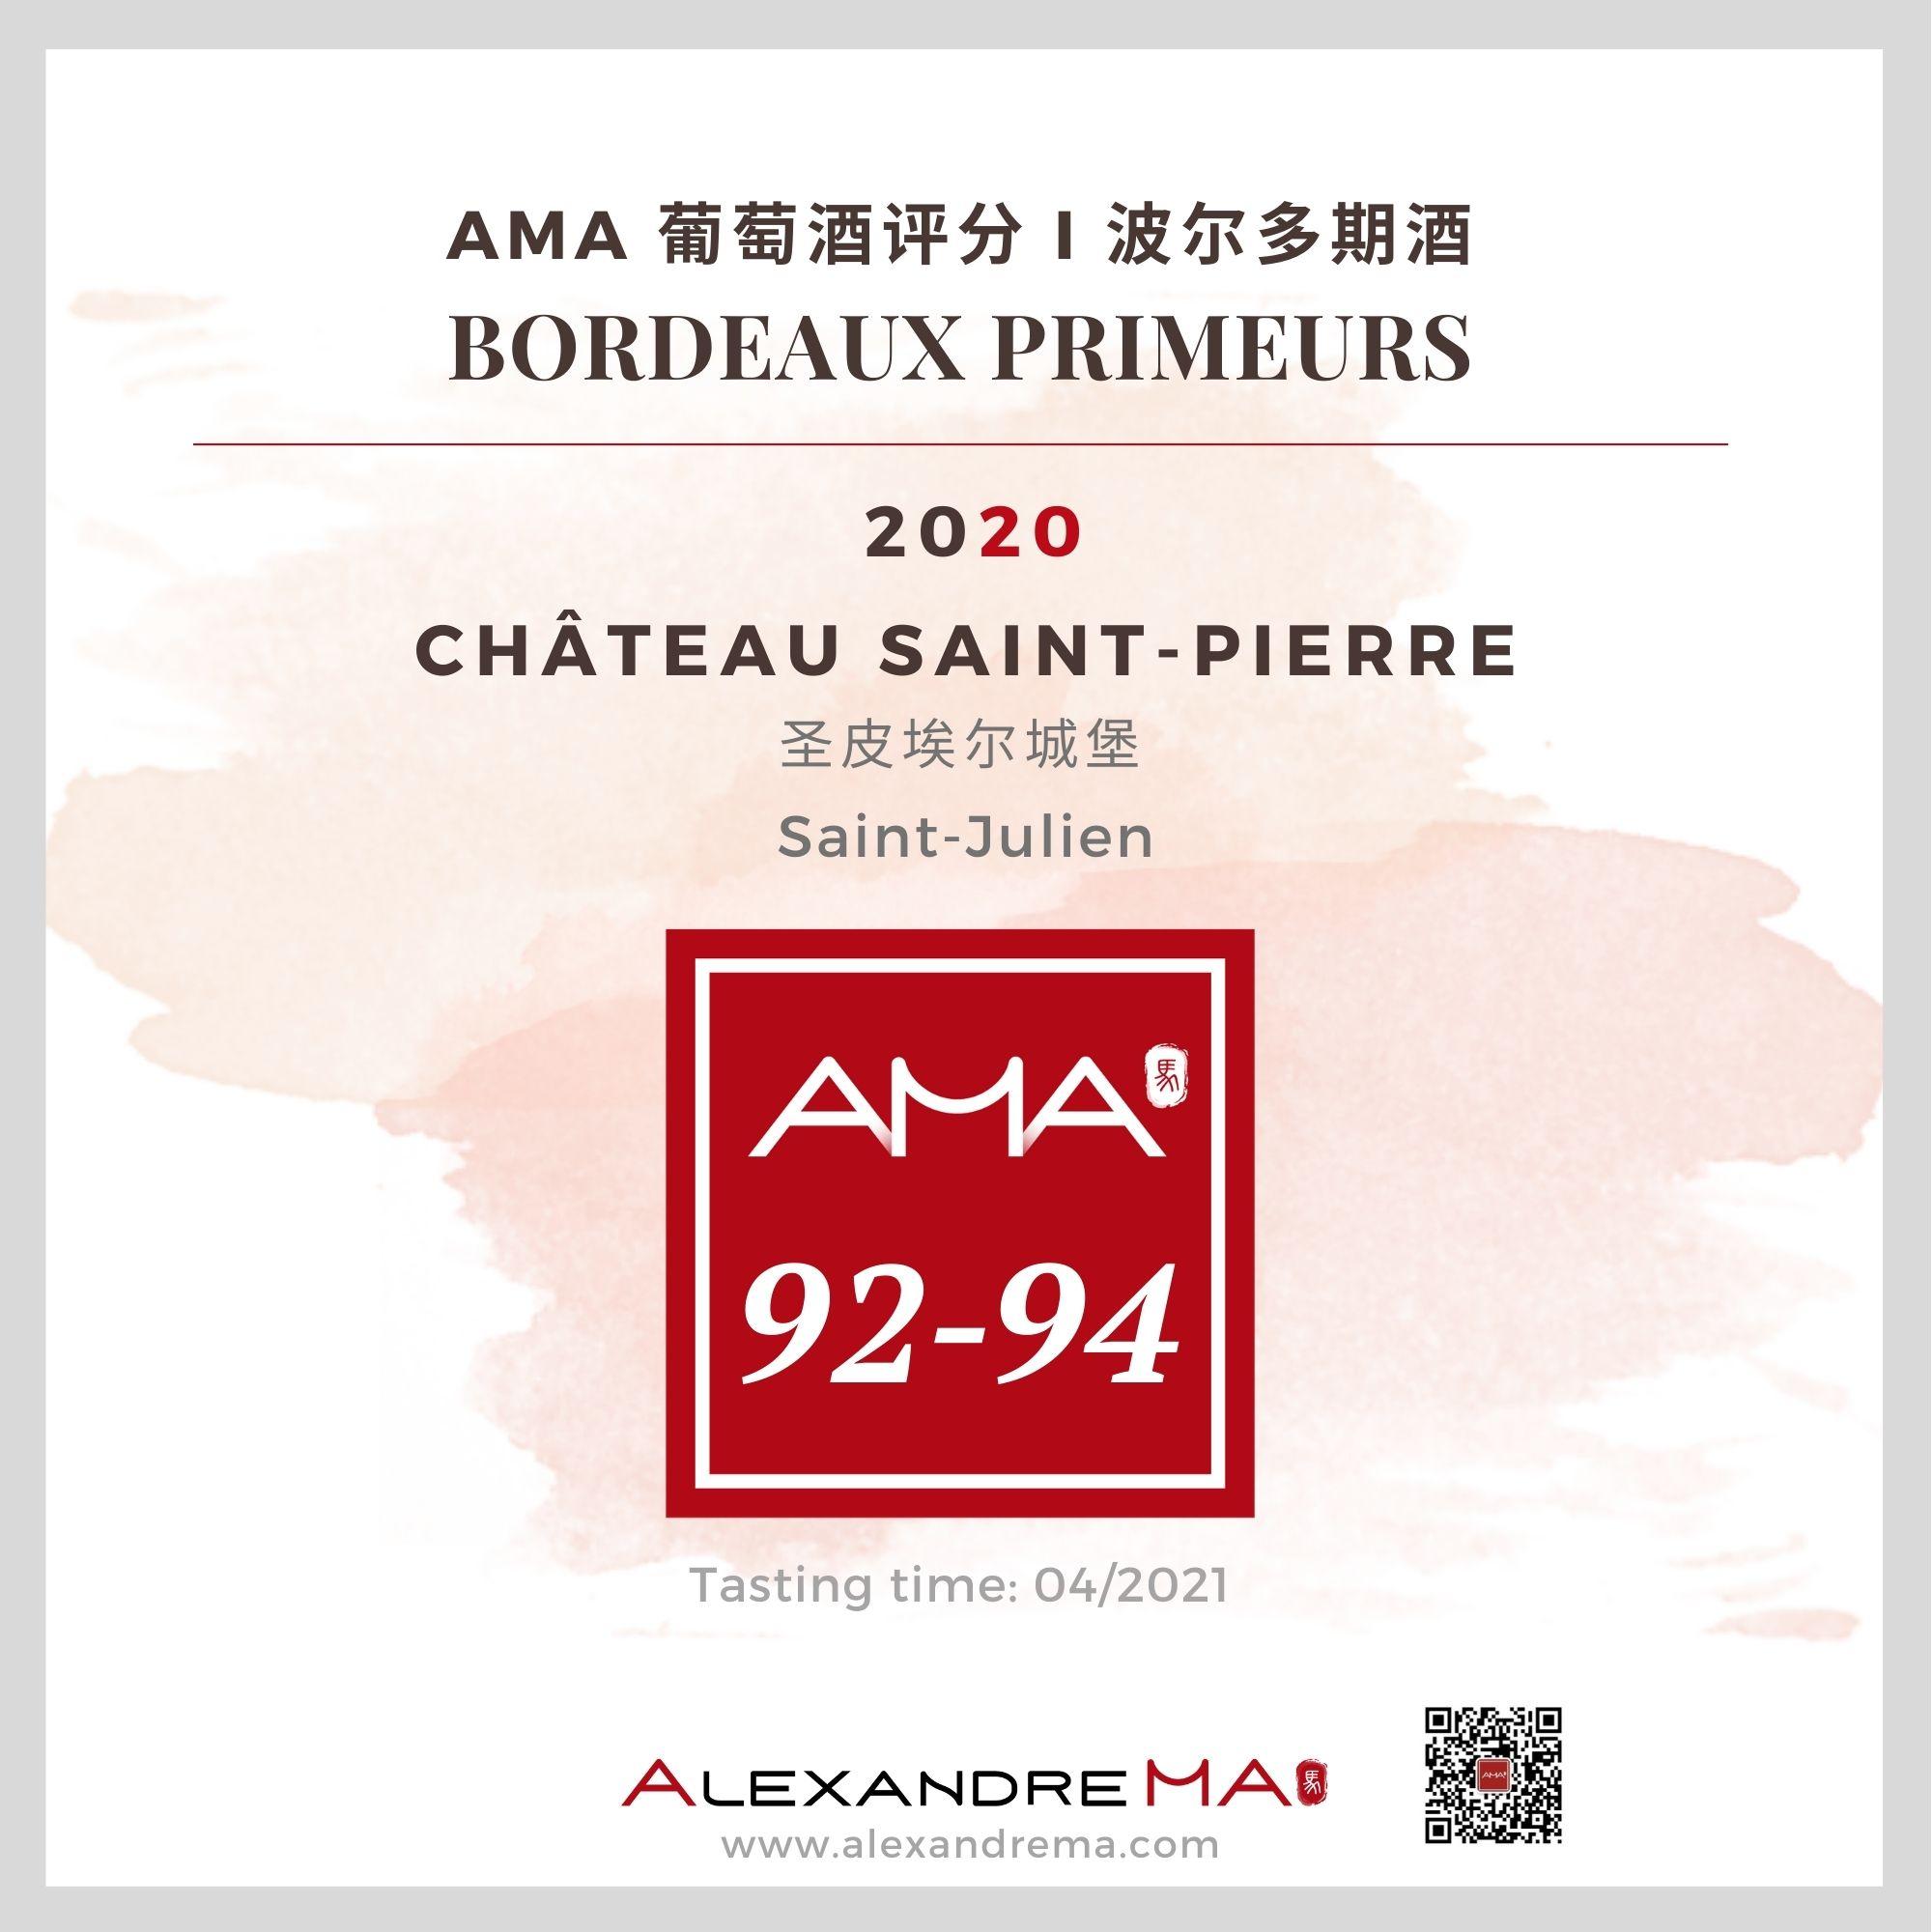 Château Saint-Pierre 2020 圣皮埃尔城堡 - Alexandre Ma